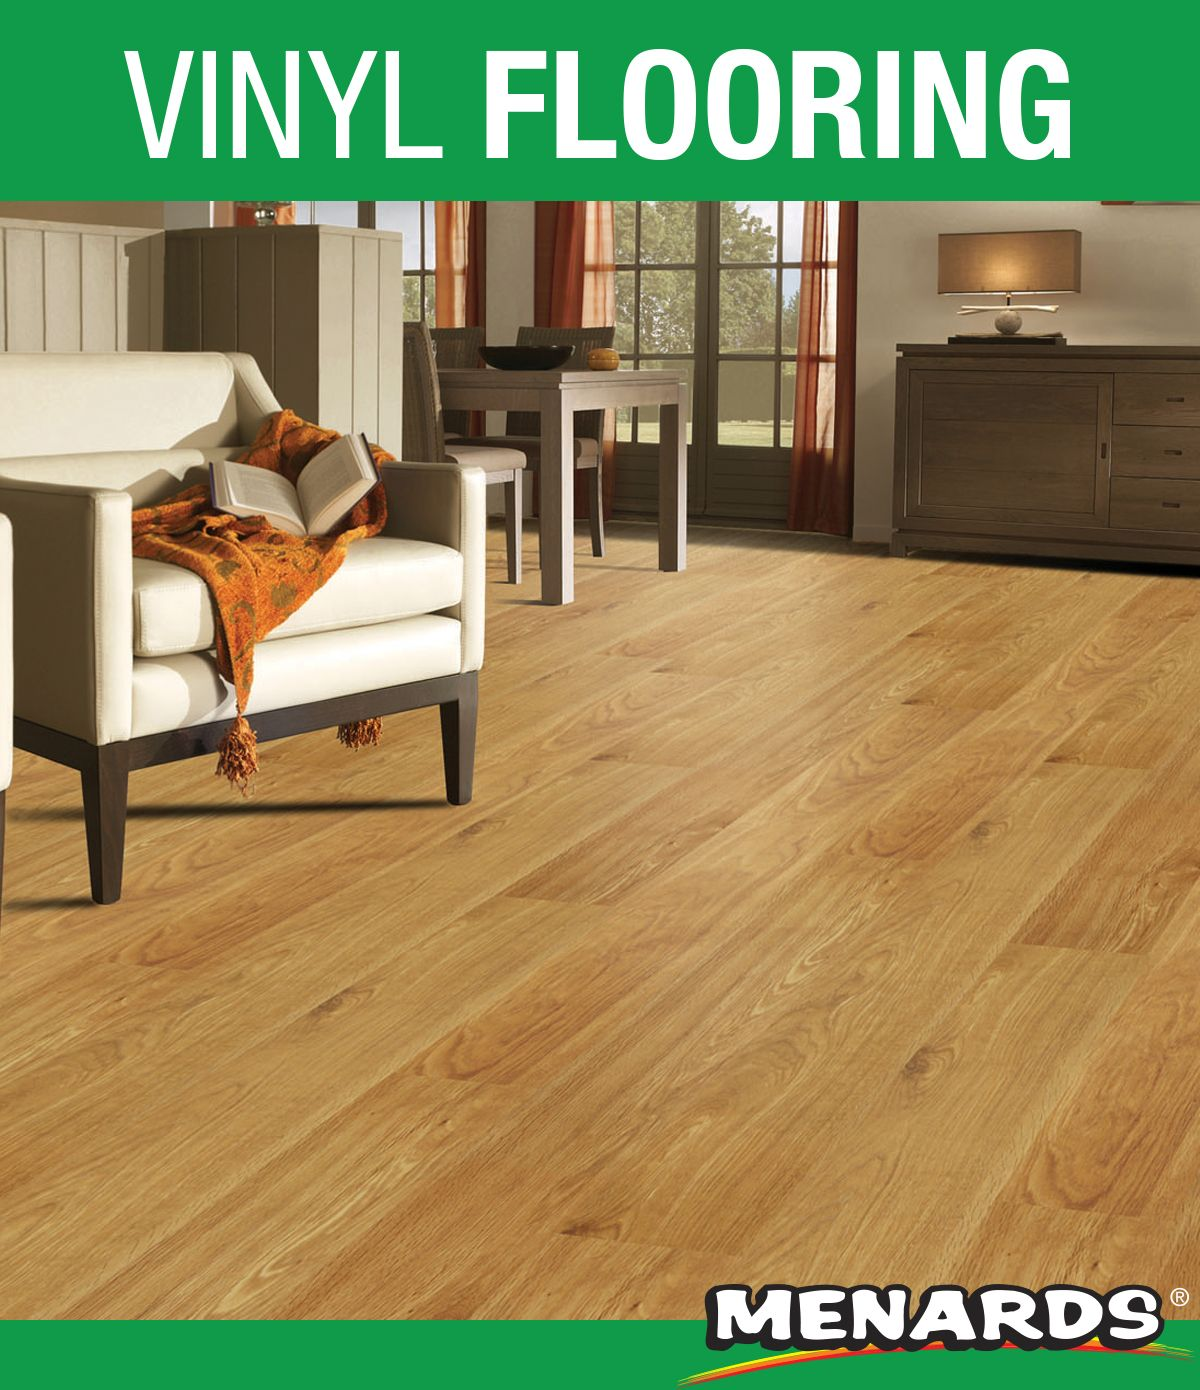 EZ Click luxury vinyl planks feature a beautiful wood